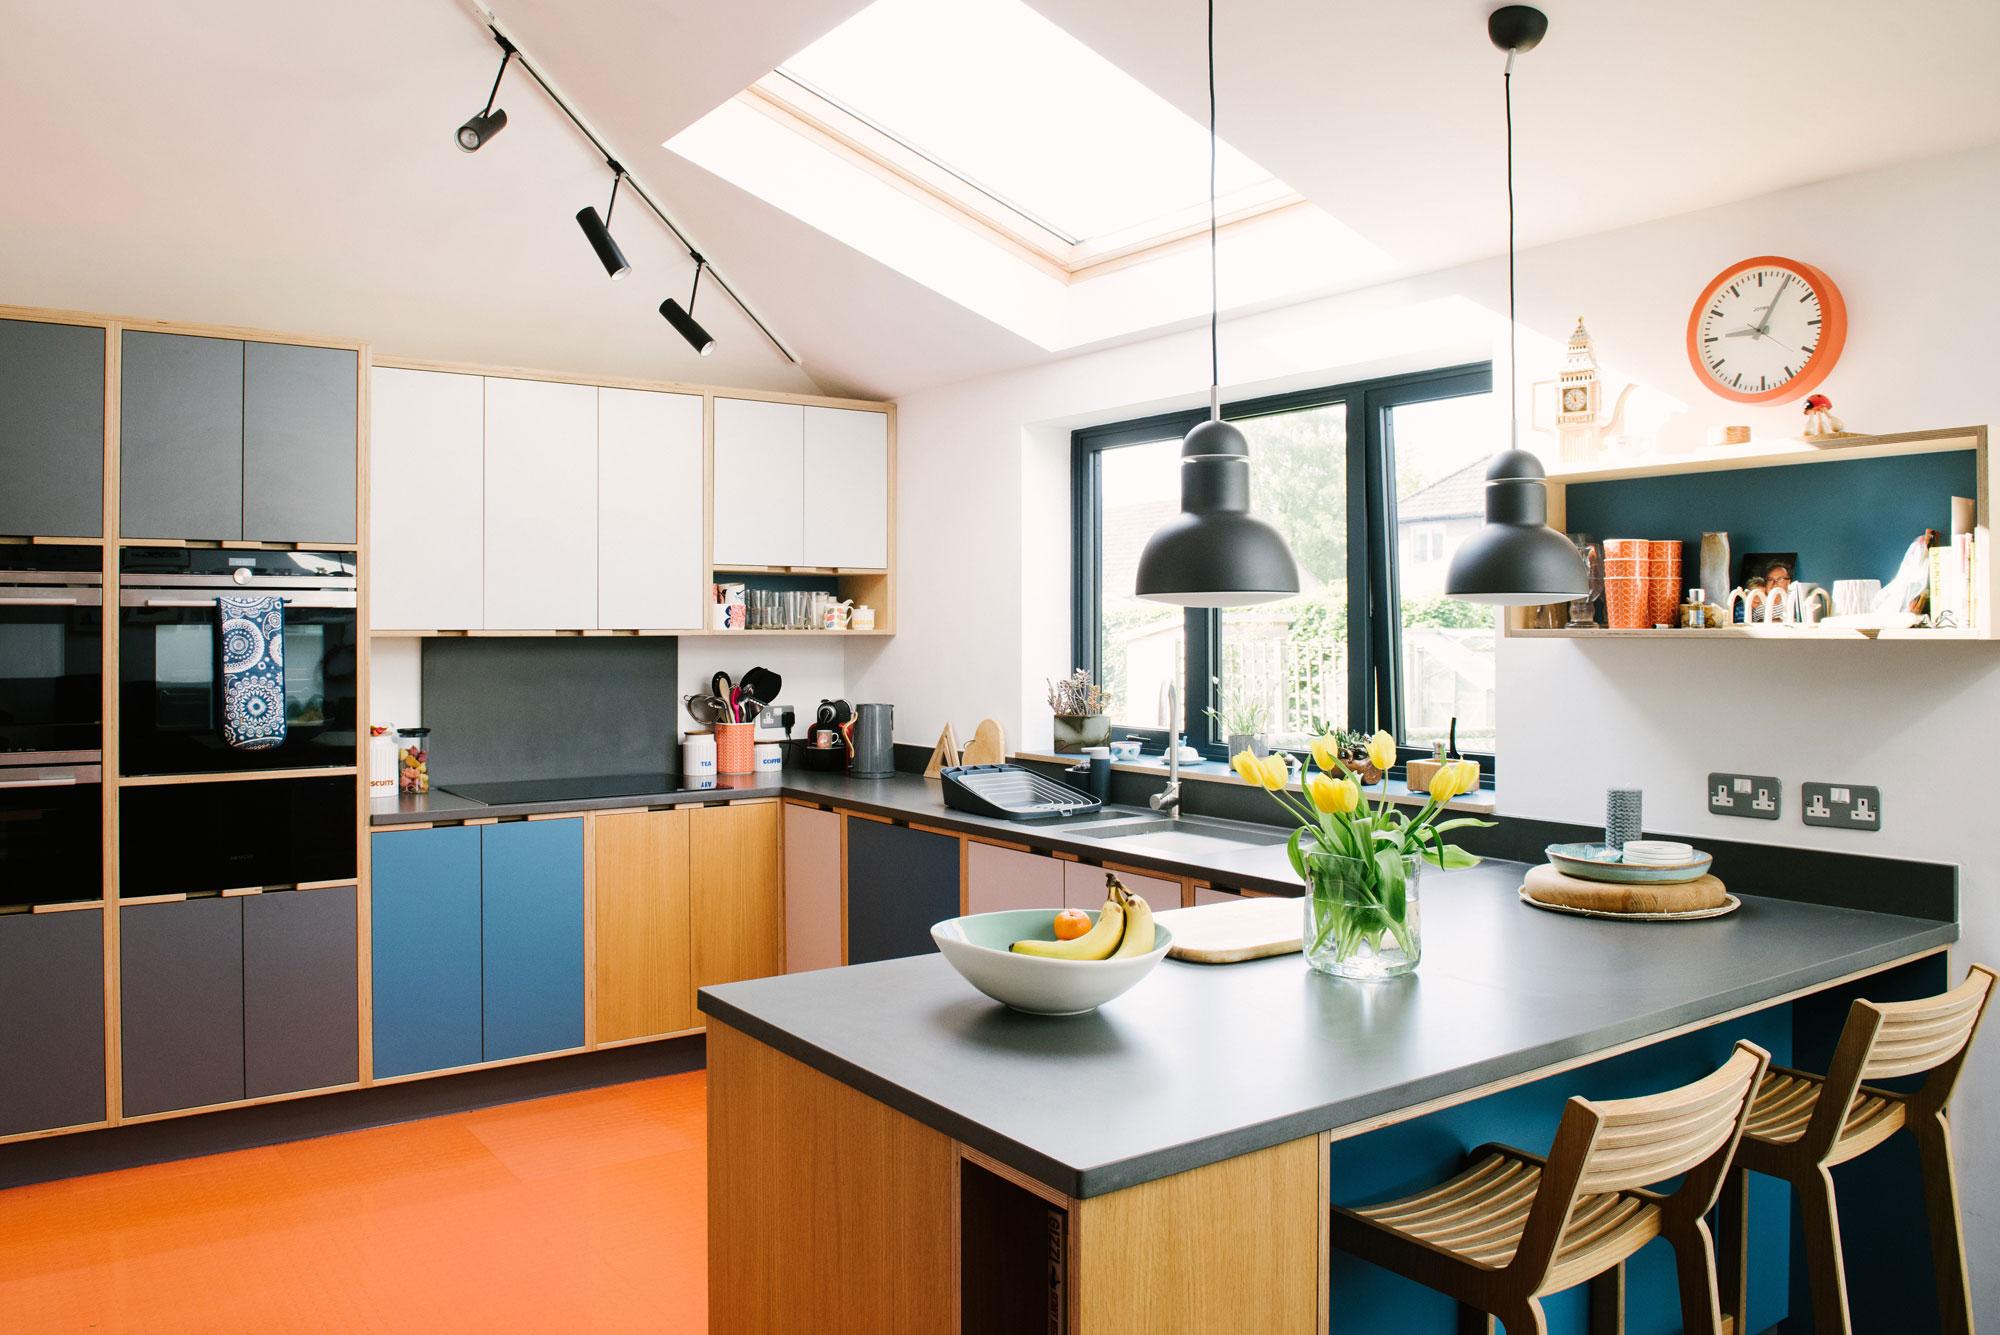 Plywood Kitchen With Orange Floor